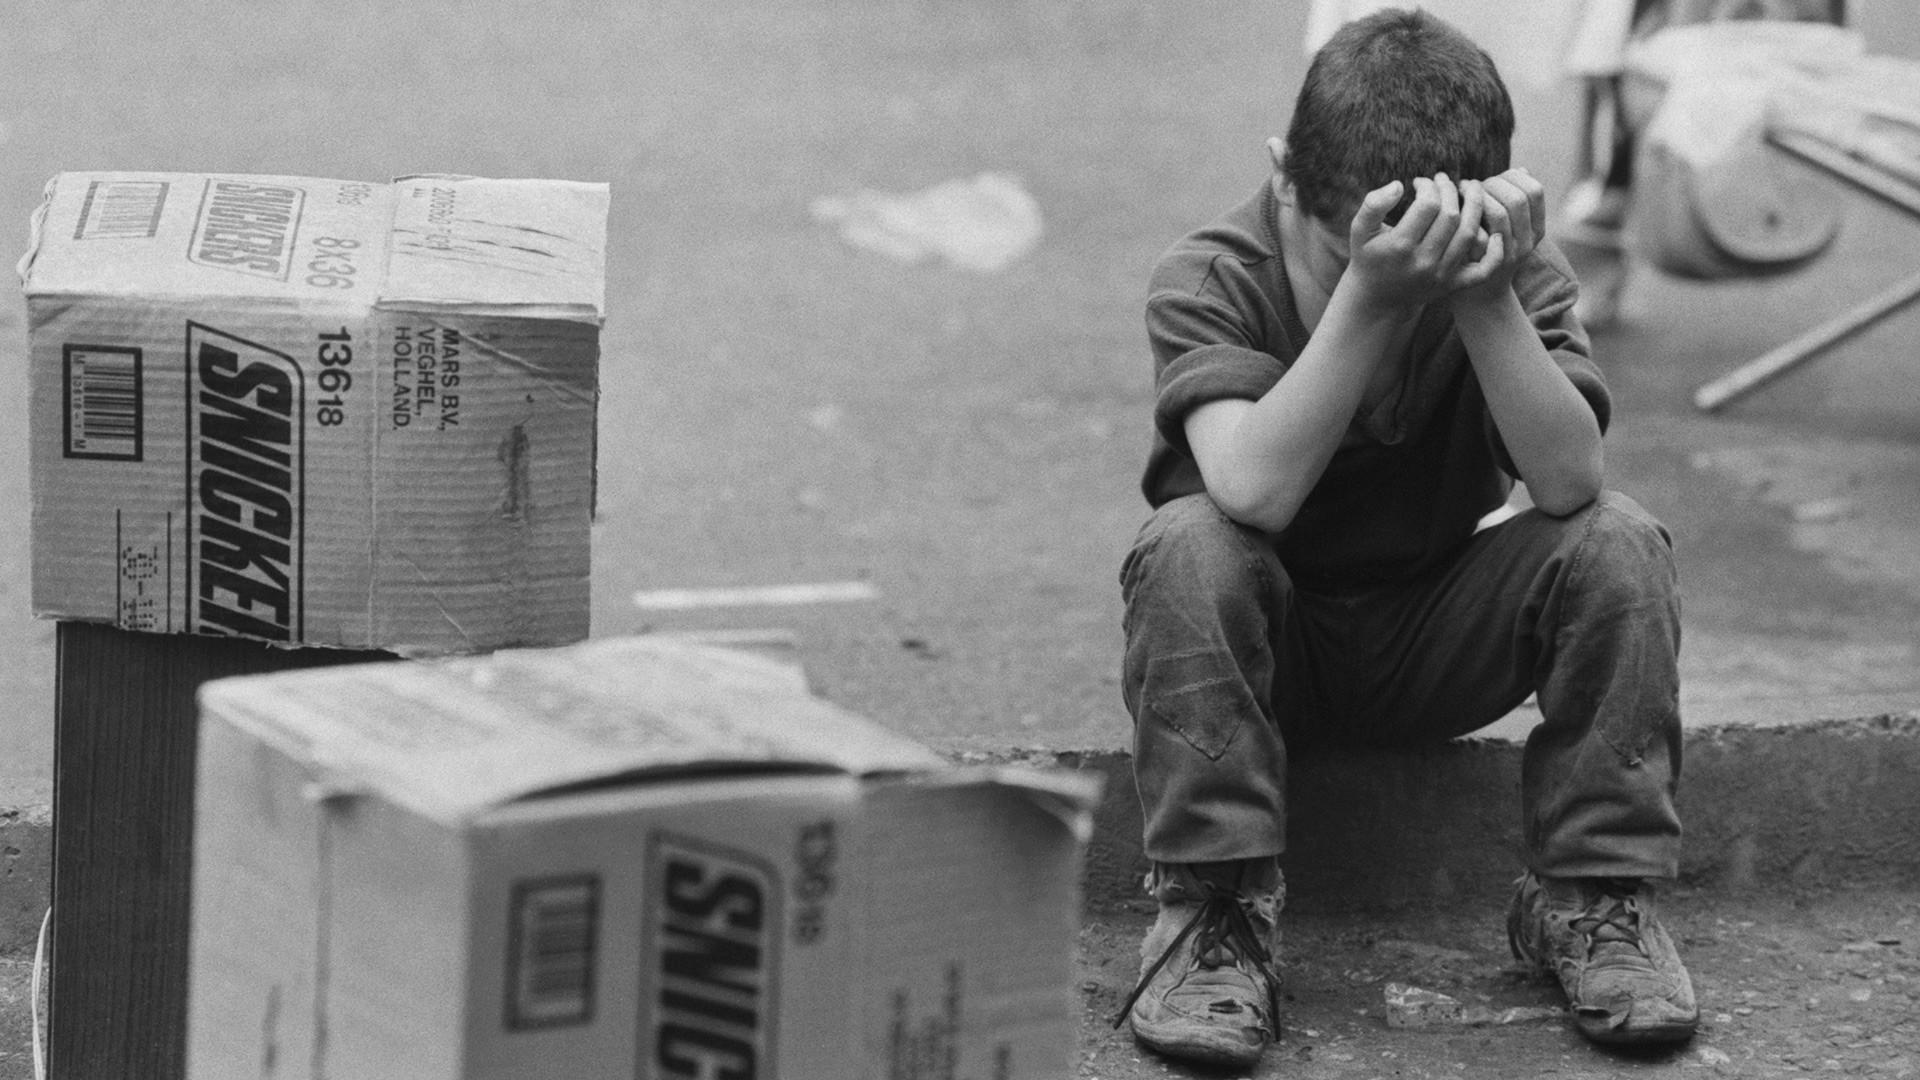 Un garçon des rues, 1993